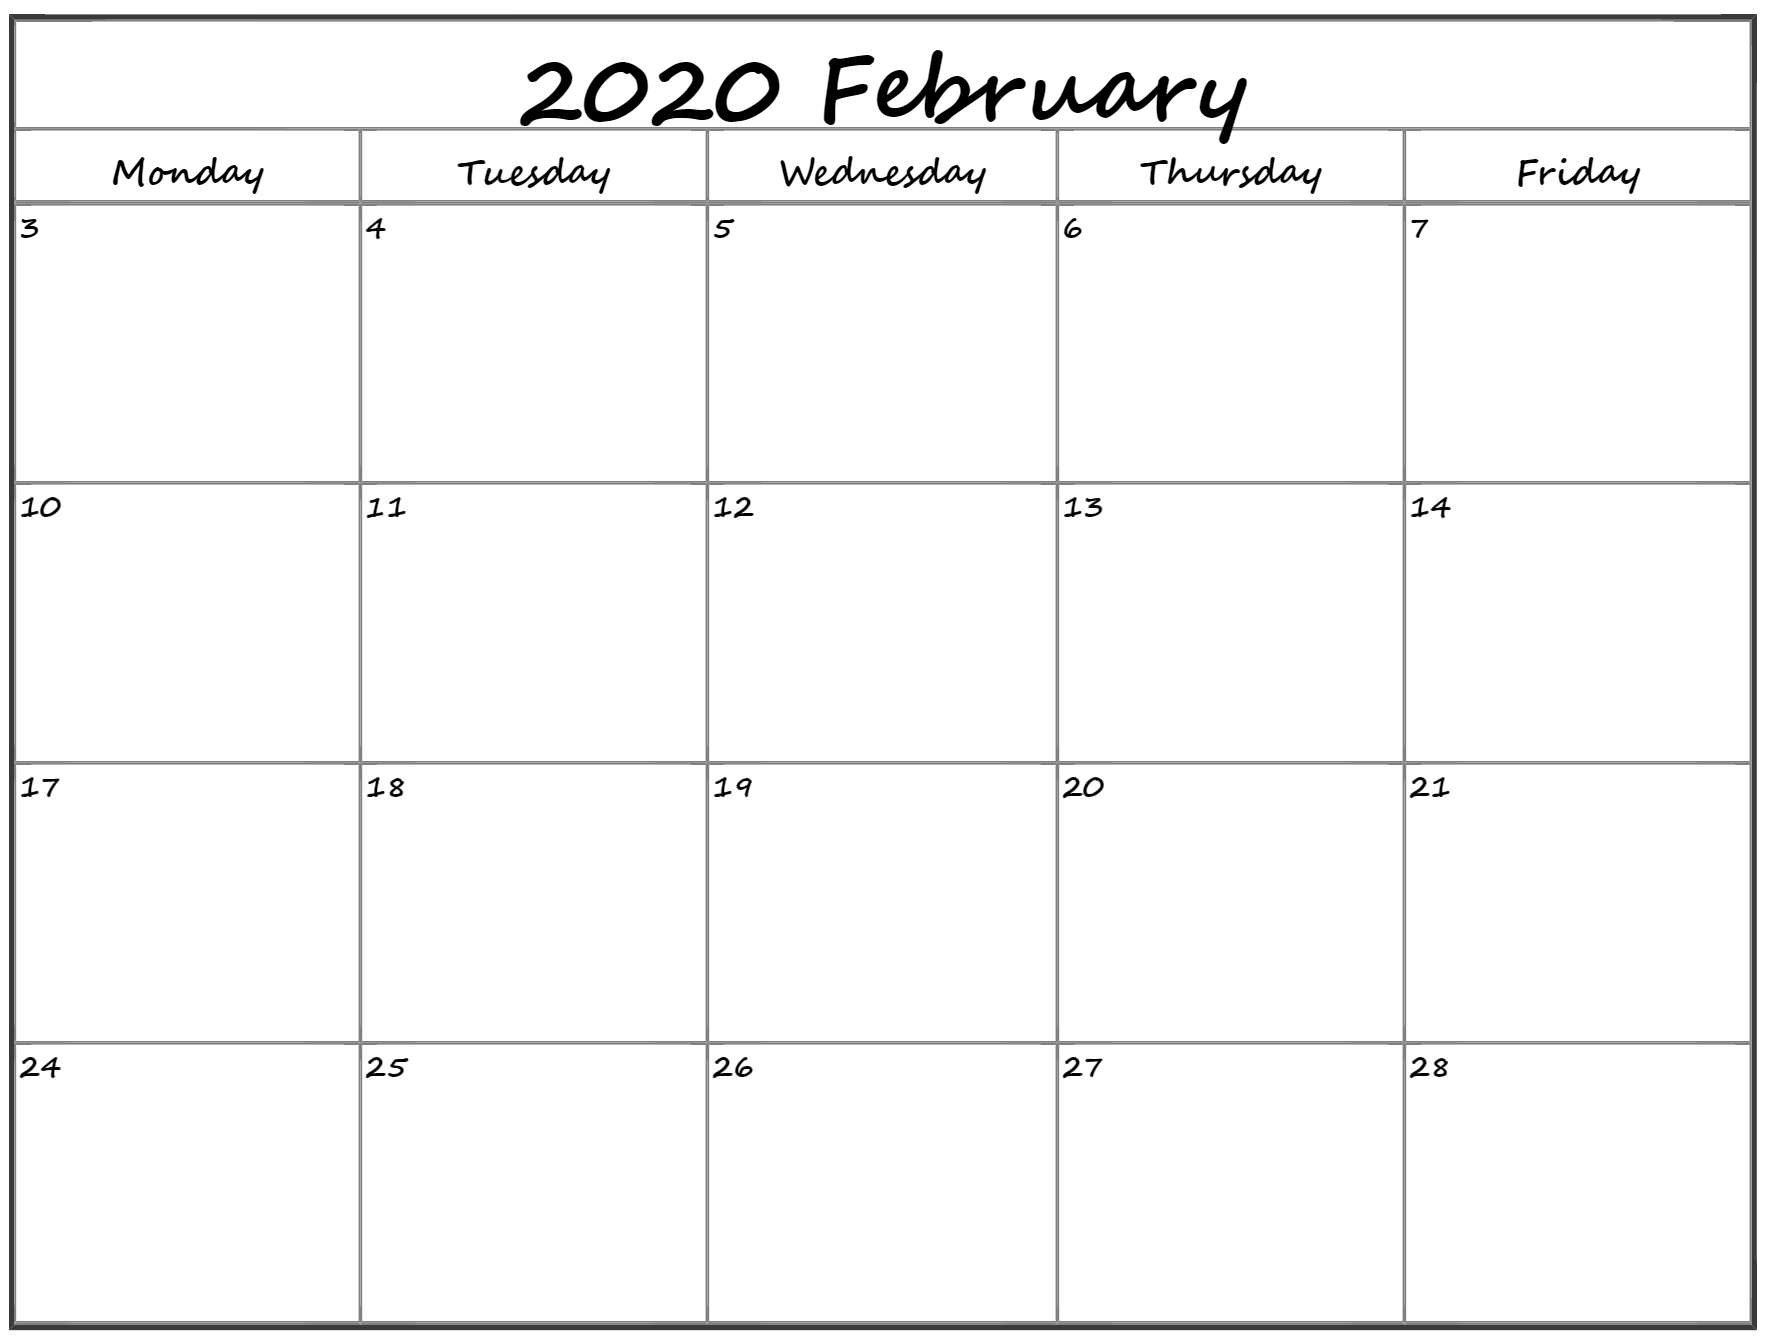 February 2020 Monday Calendar   Monday To Sunday Free Printable Calendar Monday To Friday